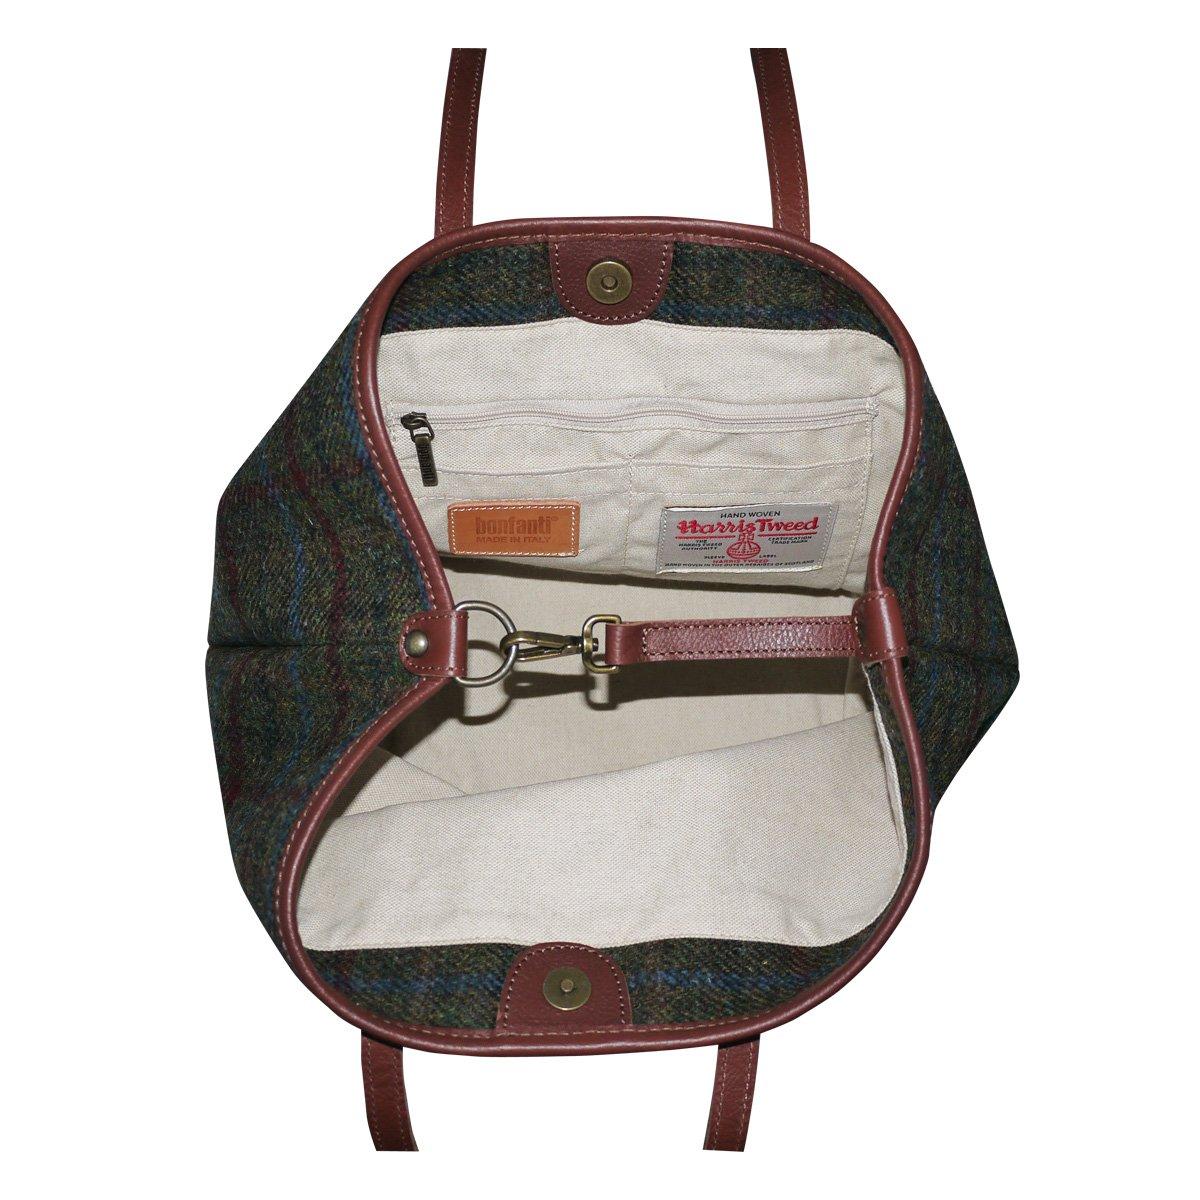 37f8f1218f35 Bonfanti Leather And Harris Tweed Tote Shopper Handbag - Tartan (green)   Amazon.co.uk  Luggage